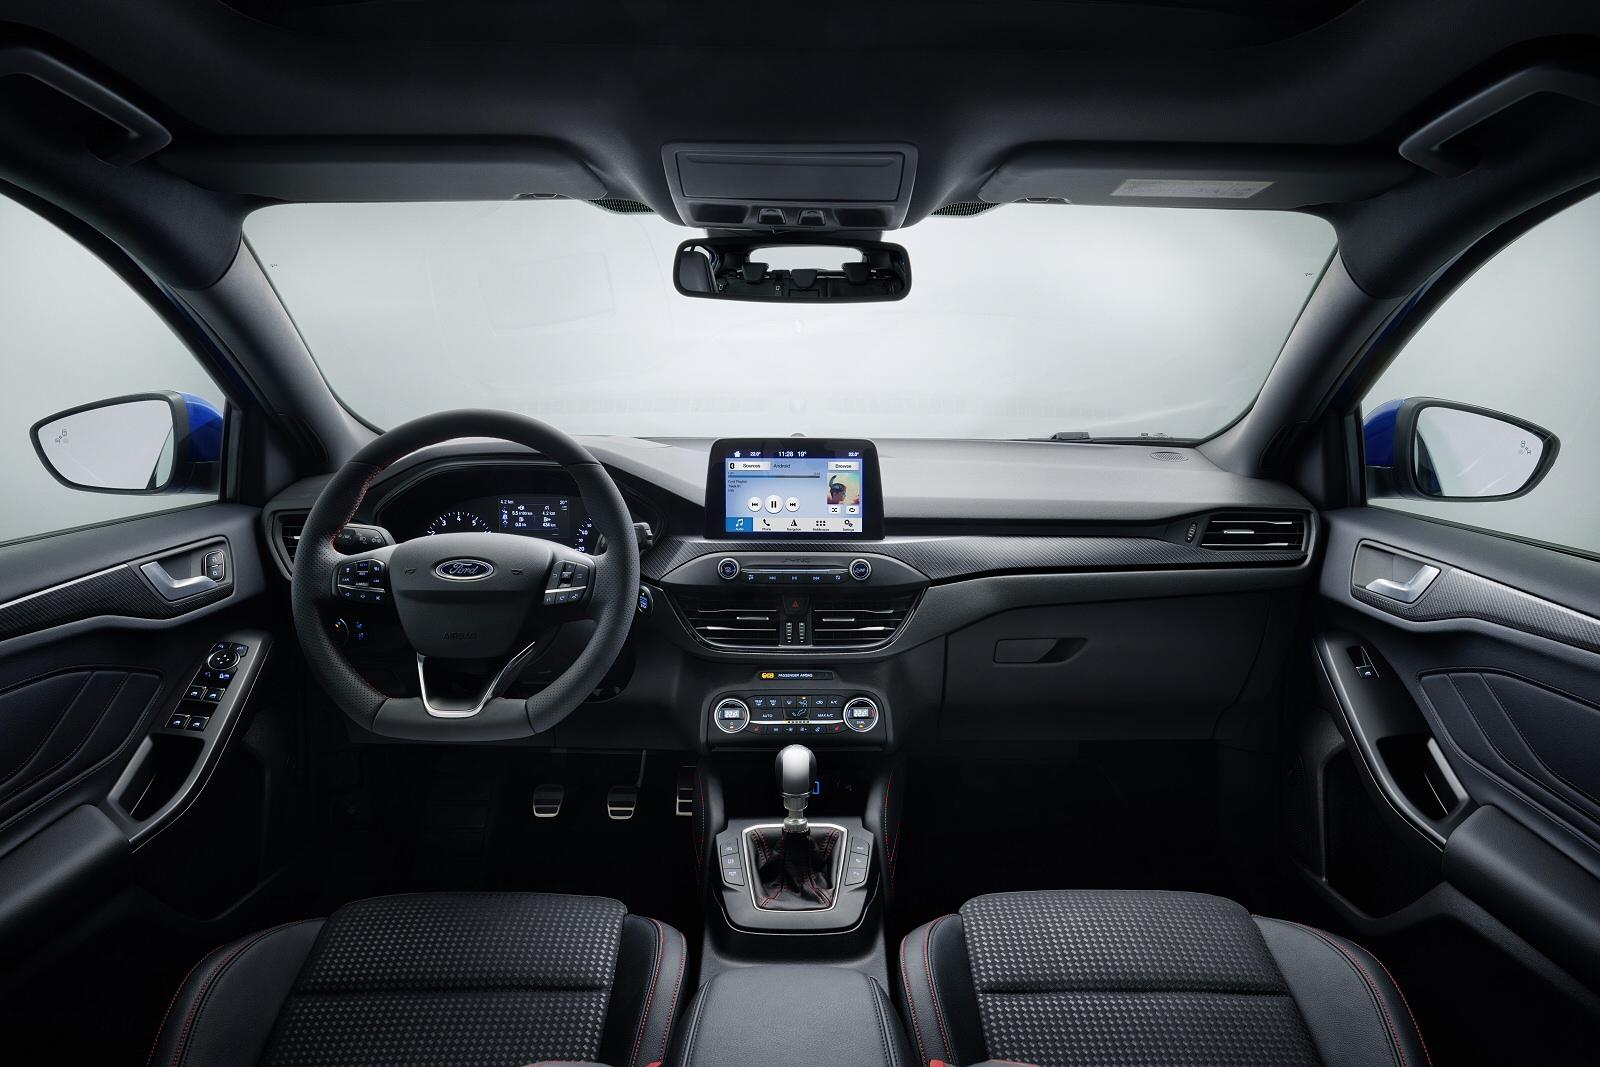 New ford focus 2 0 ecoblue st line nav 5dr auto diesel hatchback for sale bristol street